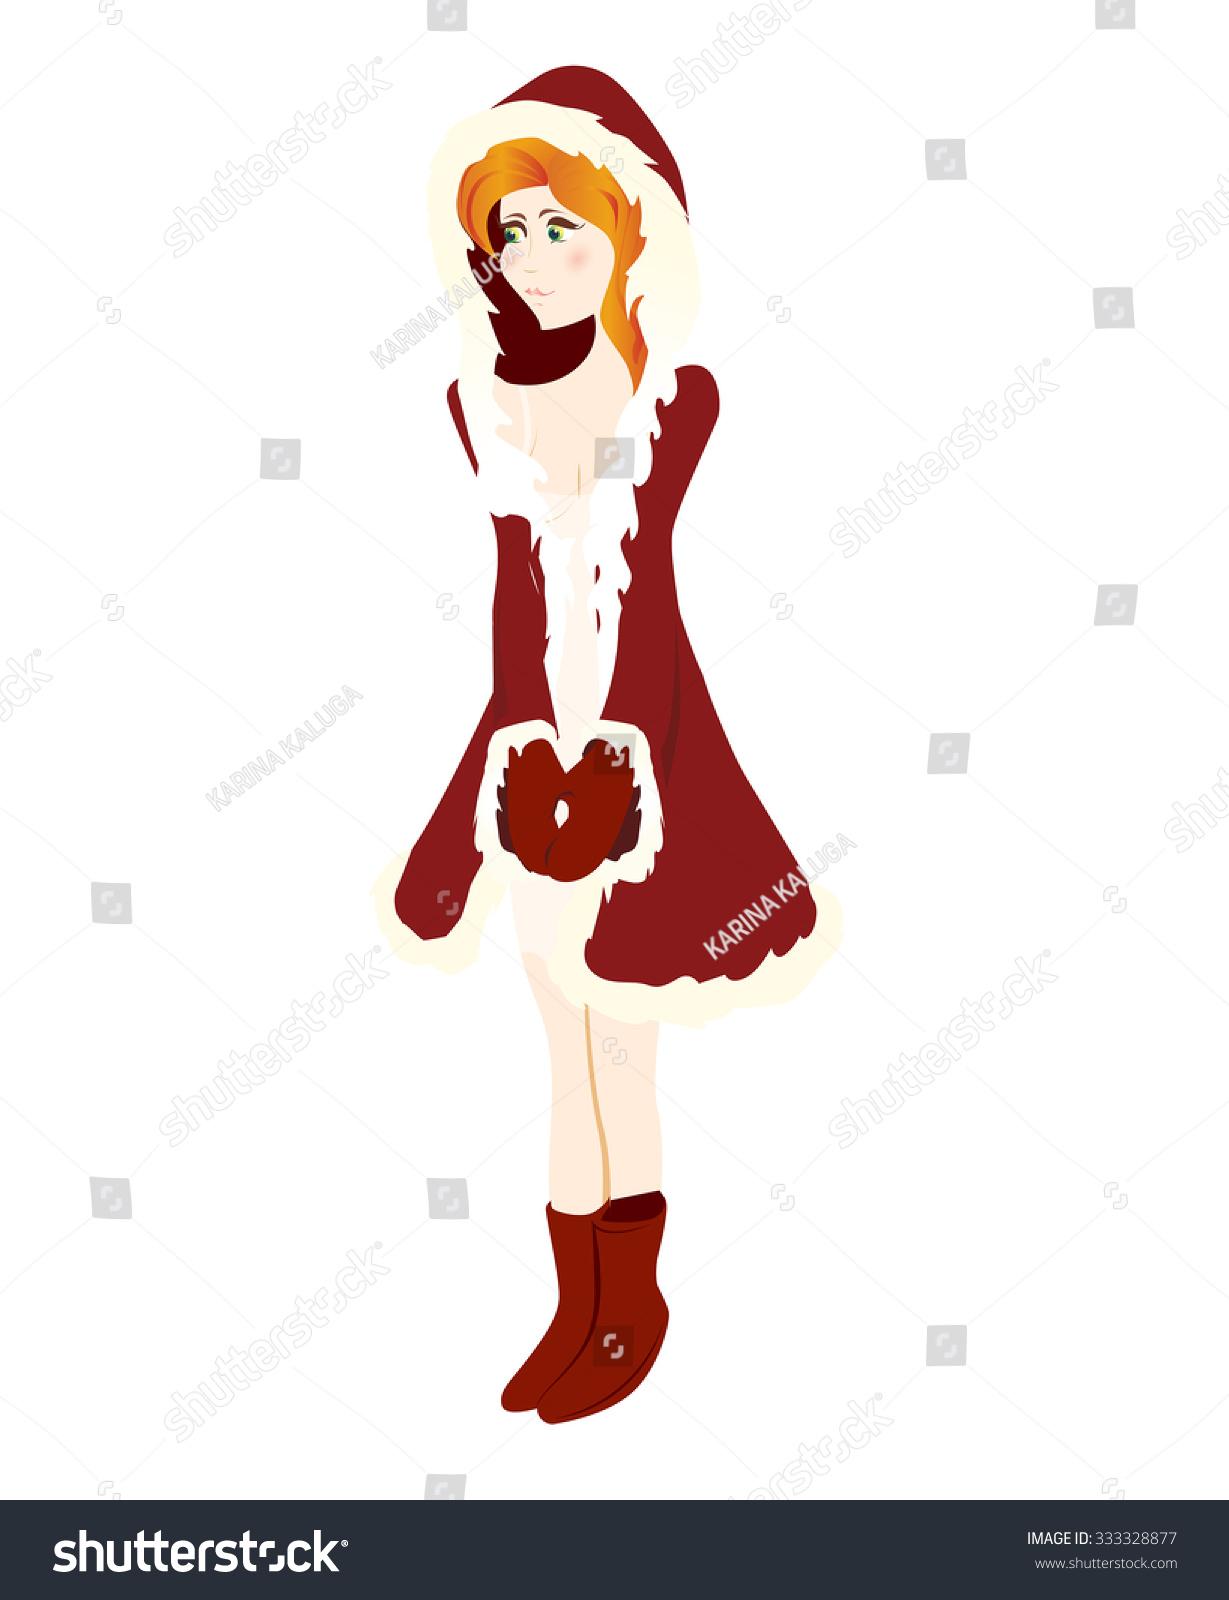 Think, redhead cartoon celebration